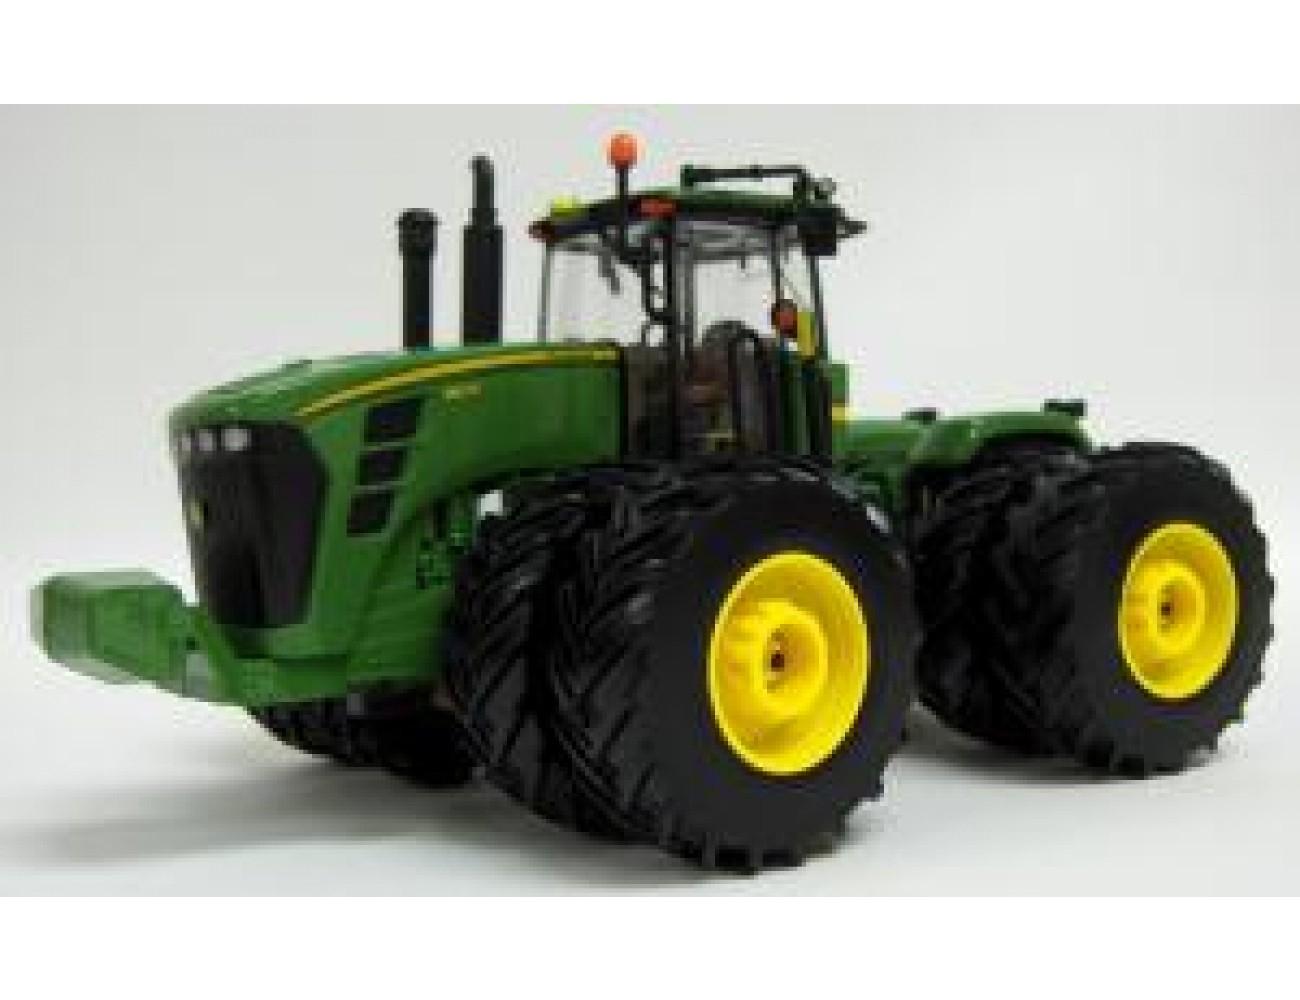 Tracteur Articulé John Deere 9630 Version Us avec Dessin Animé De Tracteur John Deere